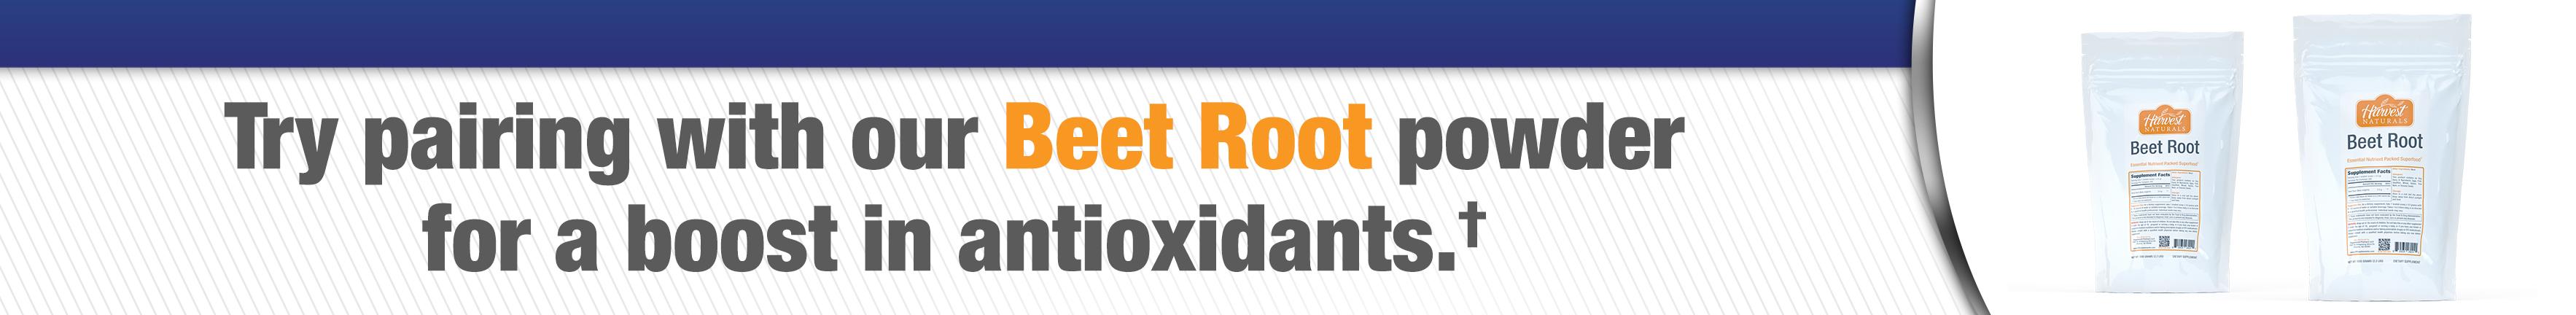 beet-root-consider-10-21.jpg